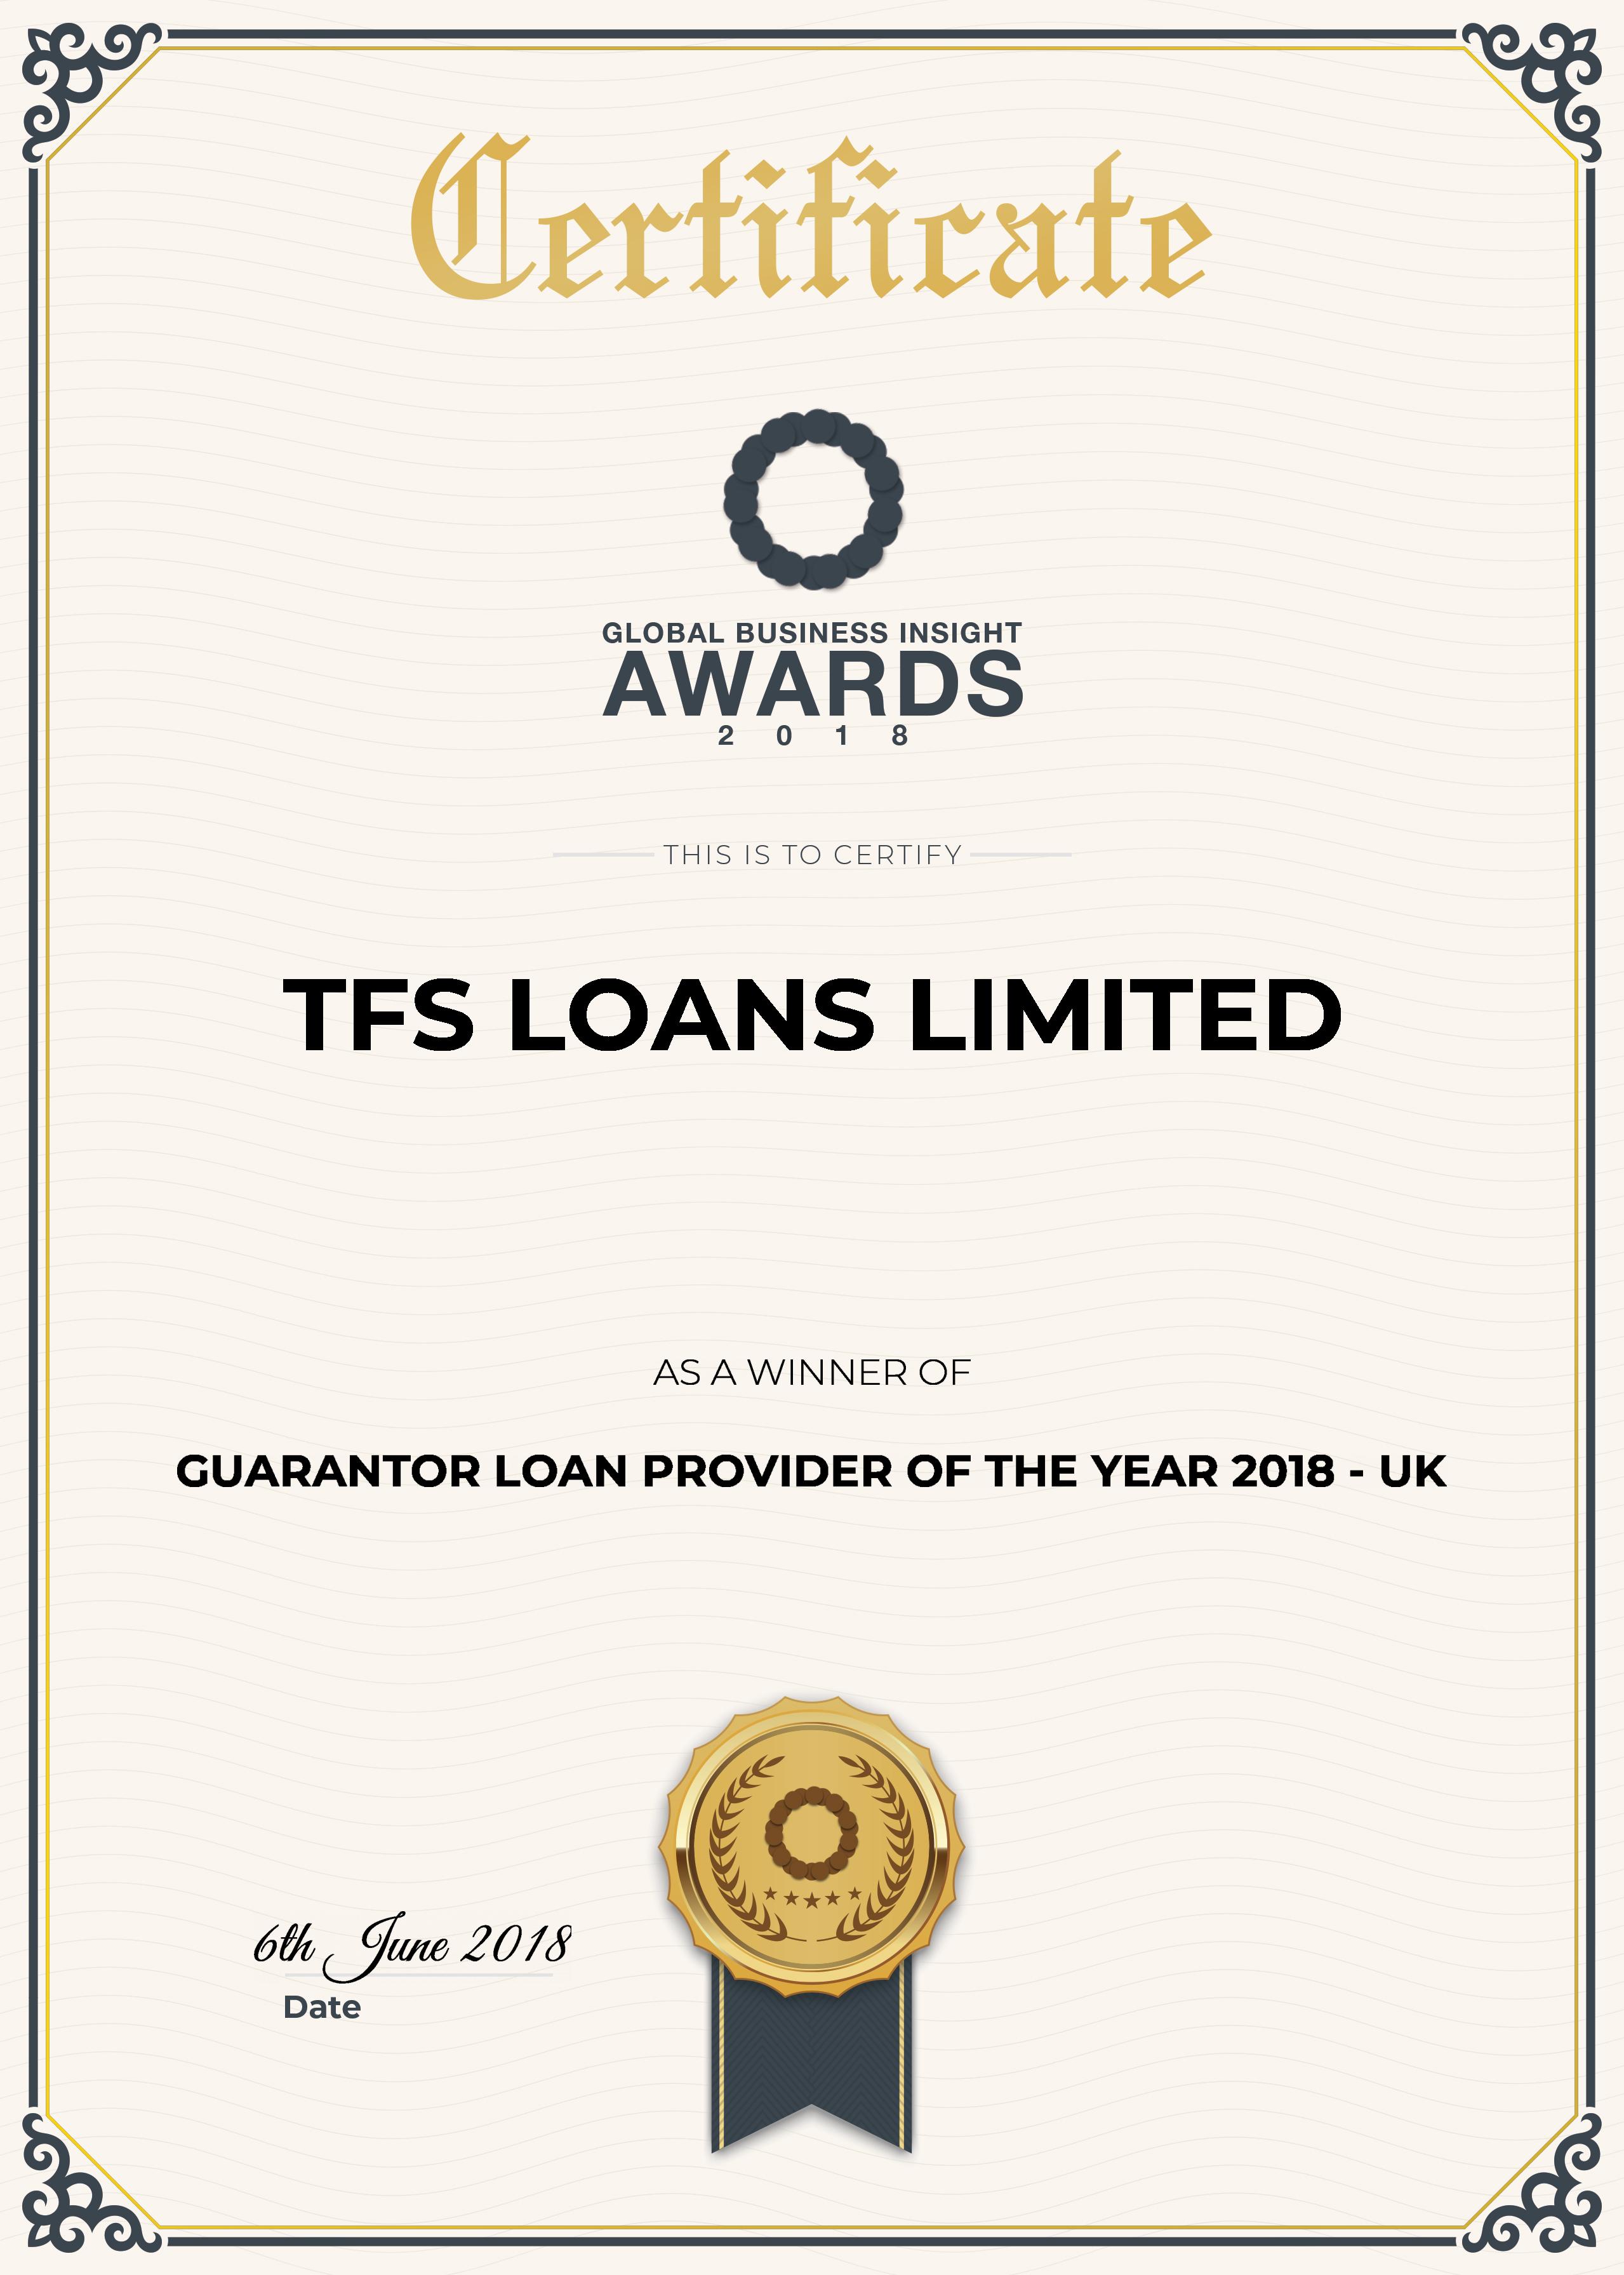 certificate award for guarantor loan provider of the year 2018 UK